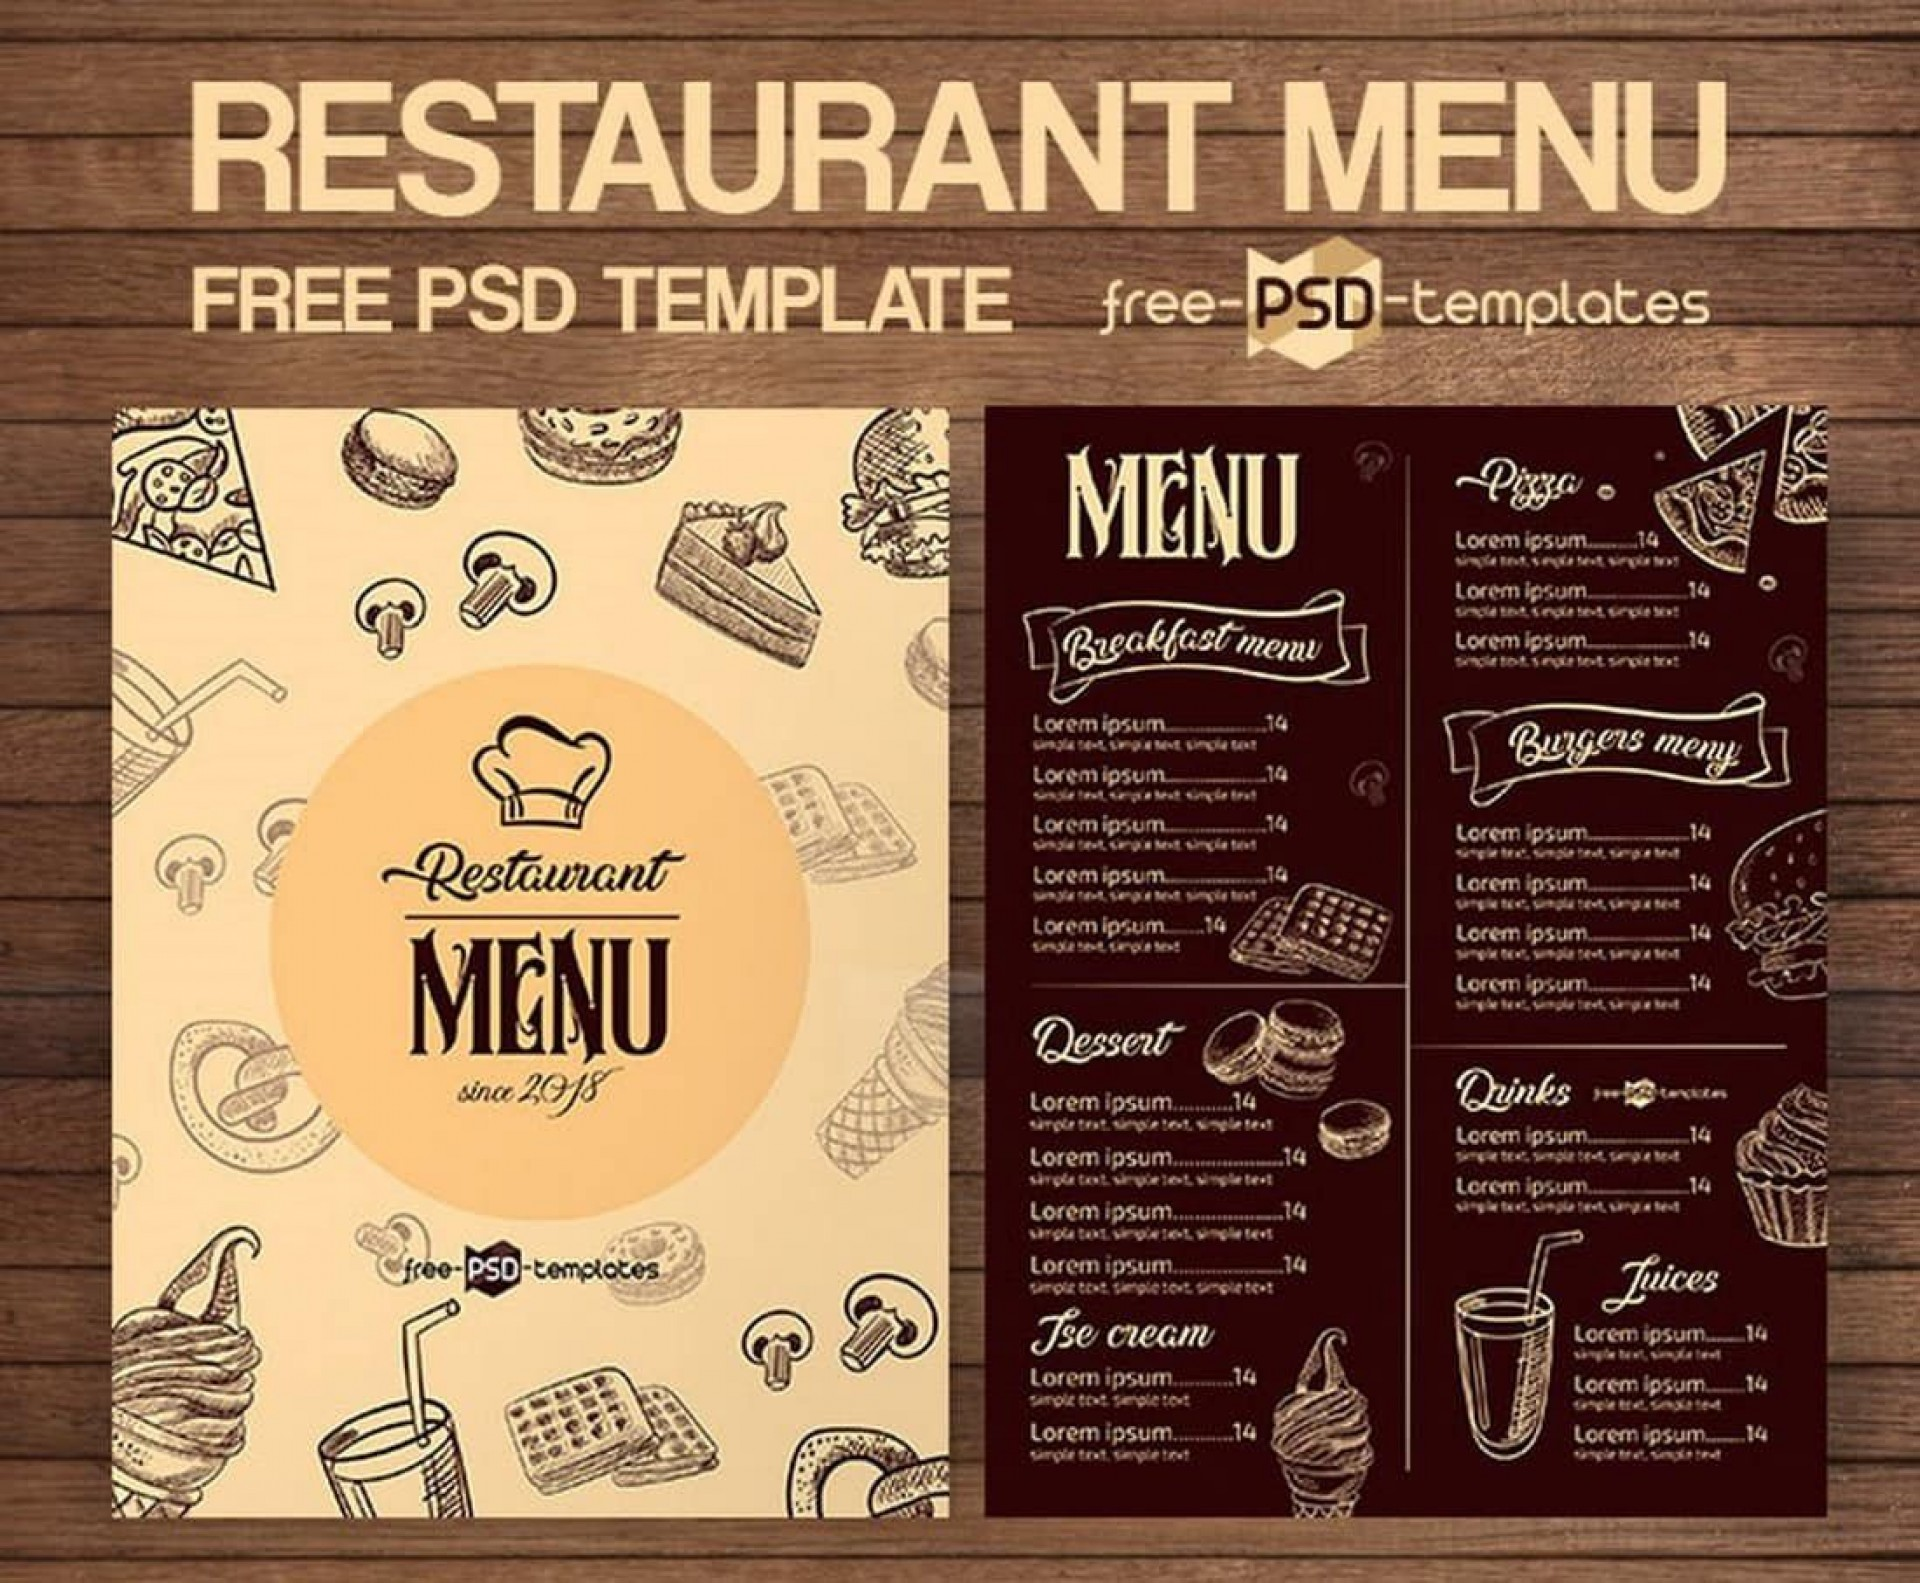 003 Wonderful Restaurant Menu Template Free Download High Definition 1920